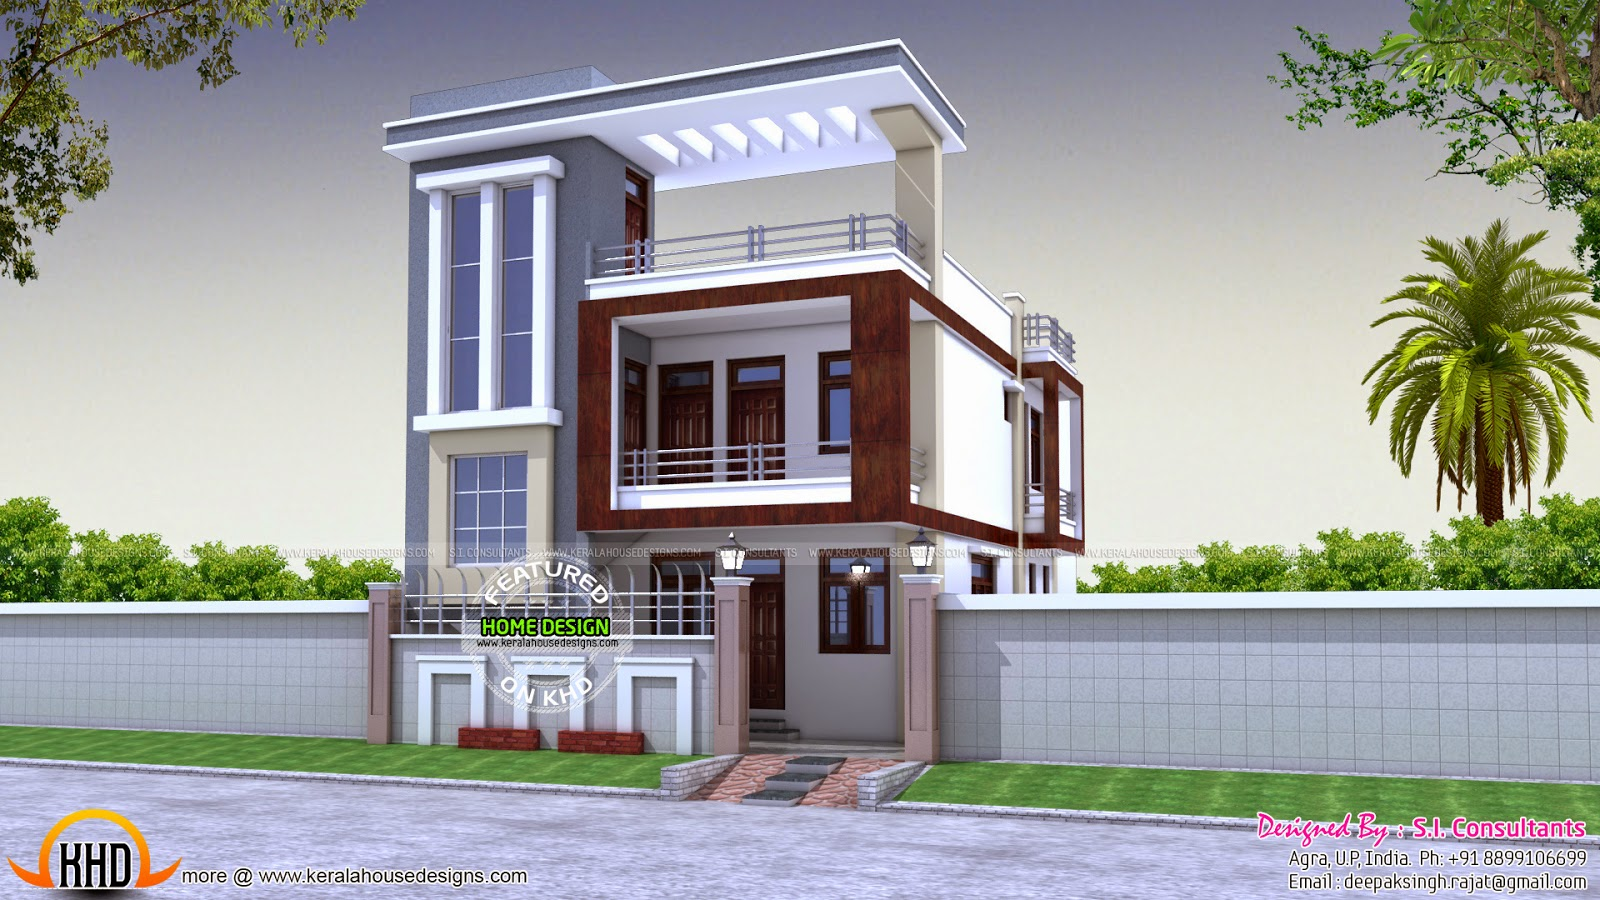 Best Kitchen Gallery: House Design Sites Home Mansion of Home Design Sites  on rachelxblog.com